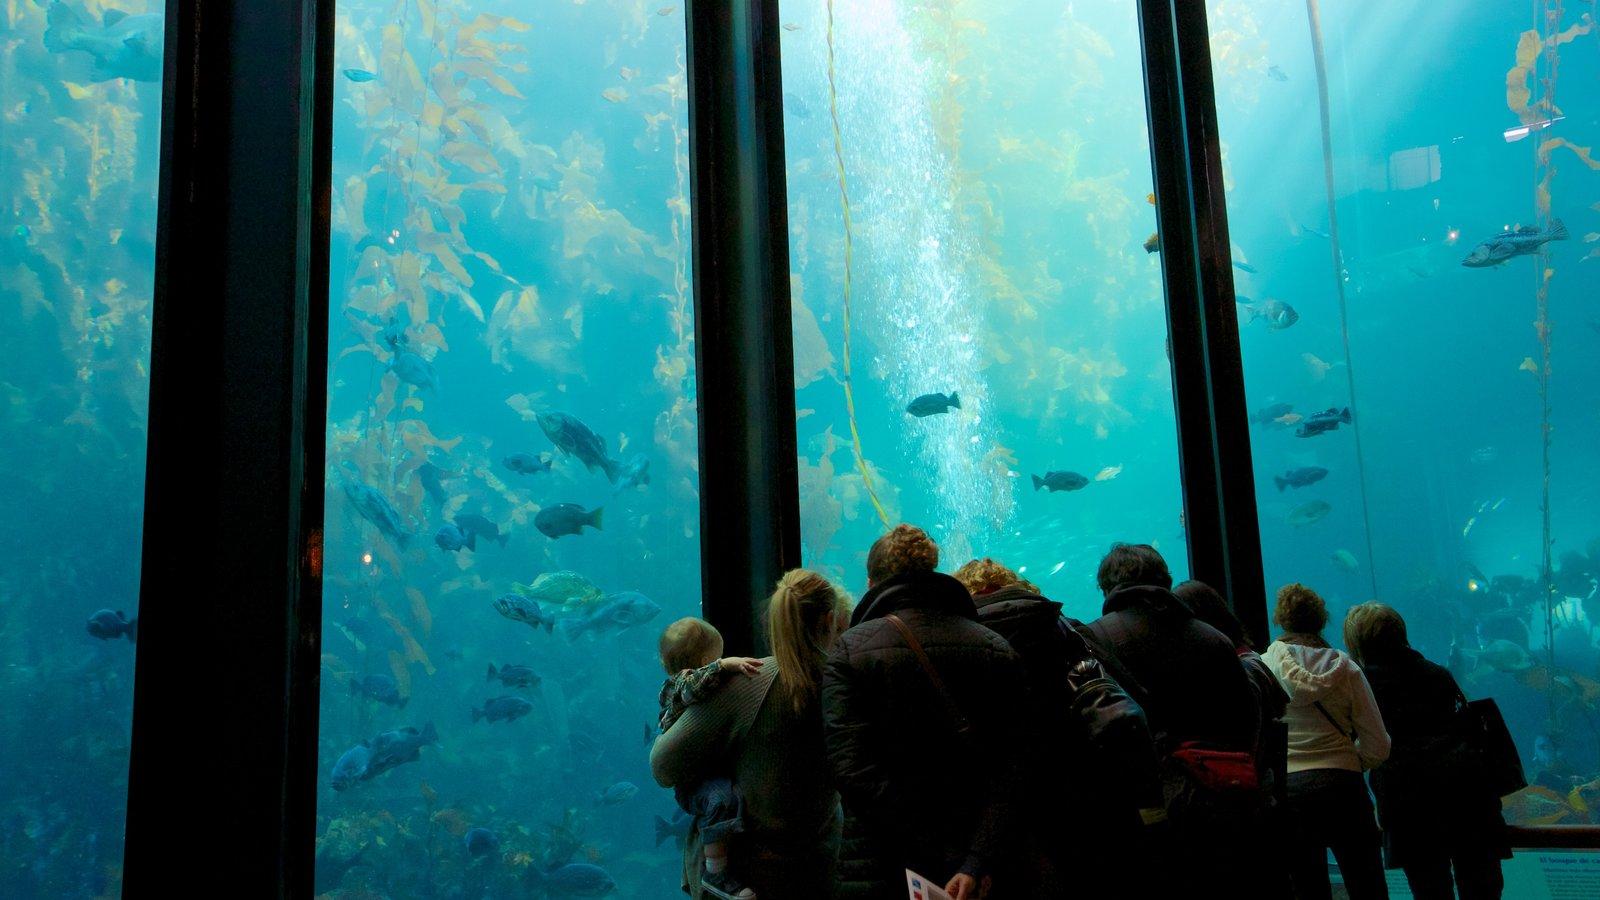 Monterey Bay Aquarium showing interior views, marine life and coral